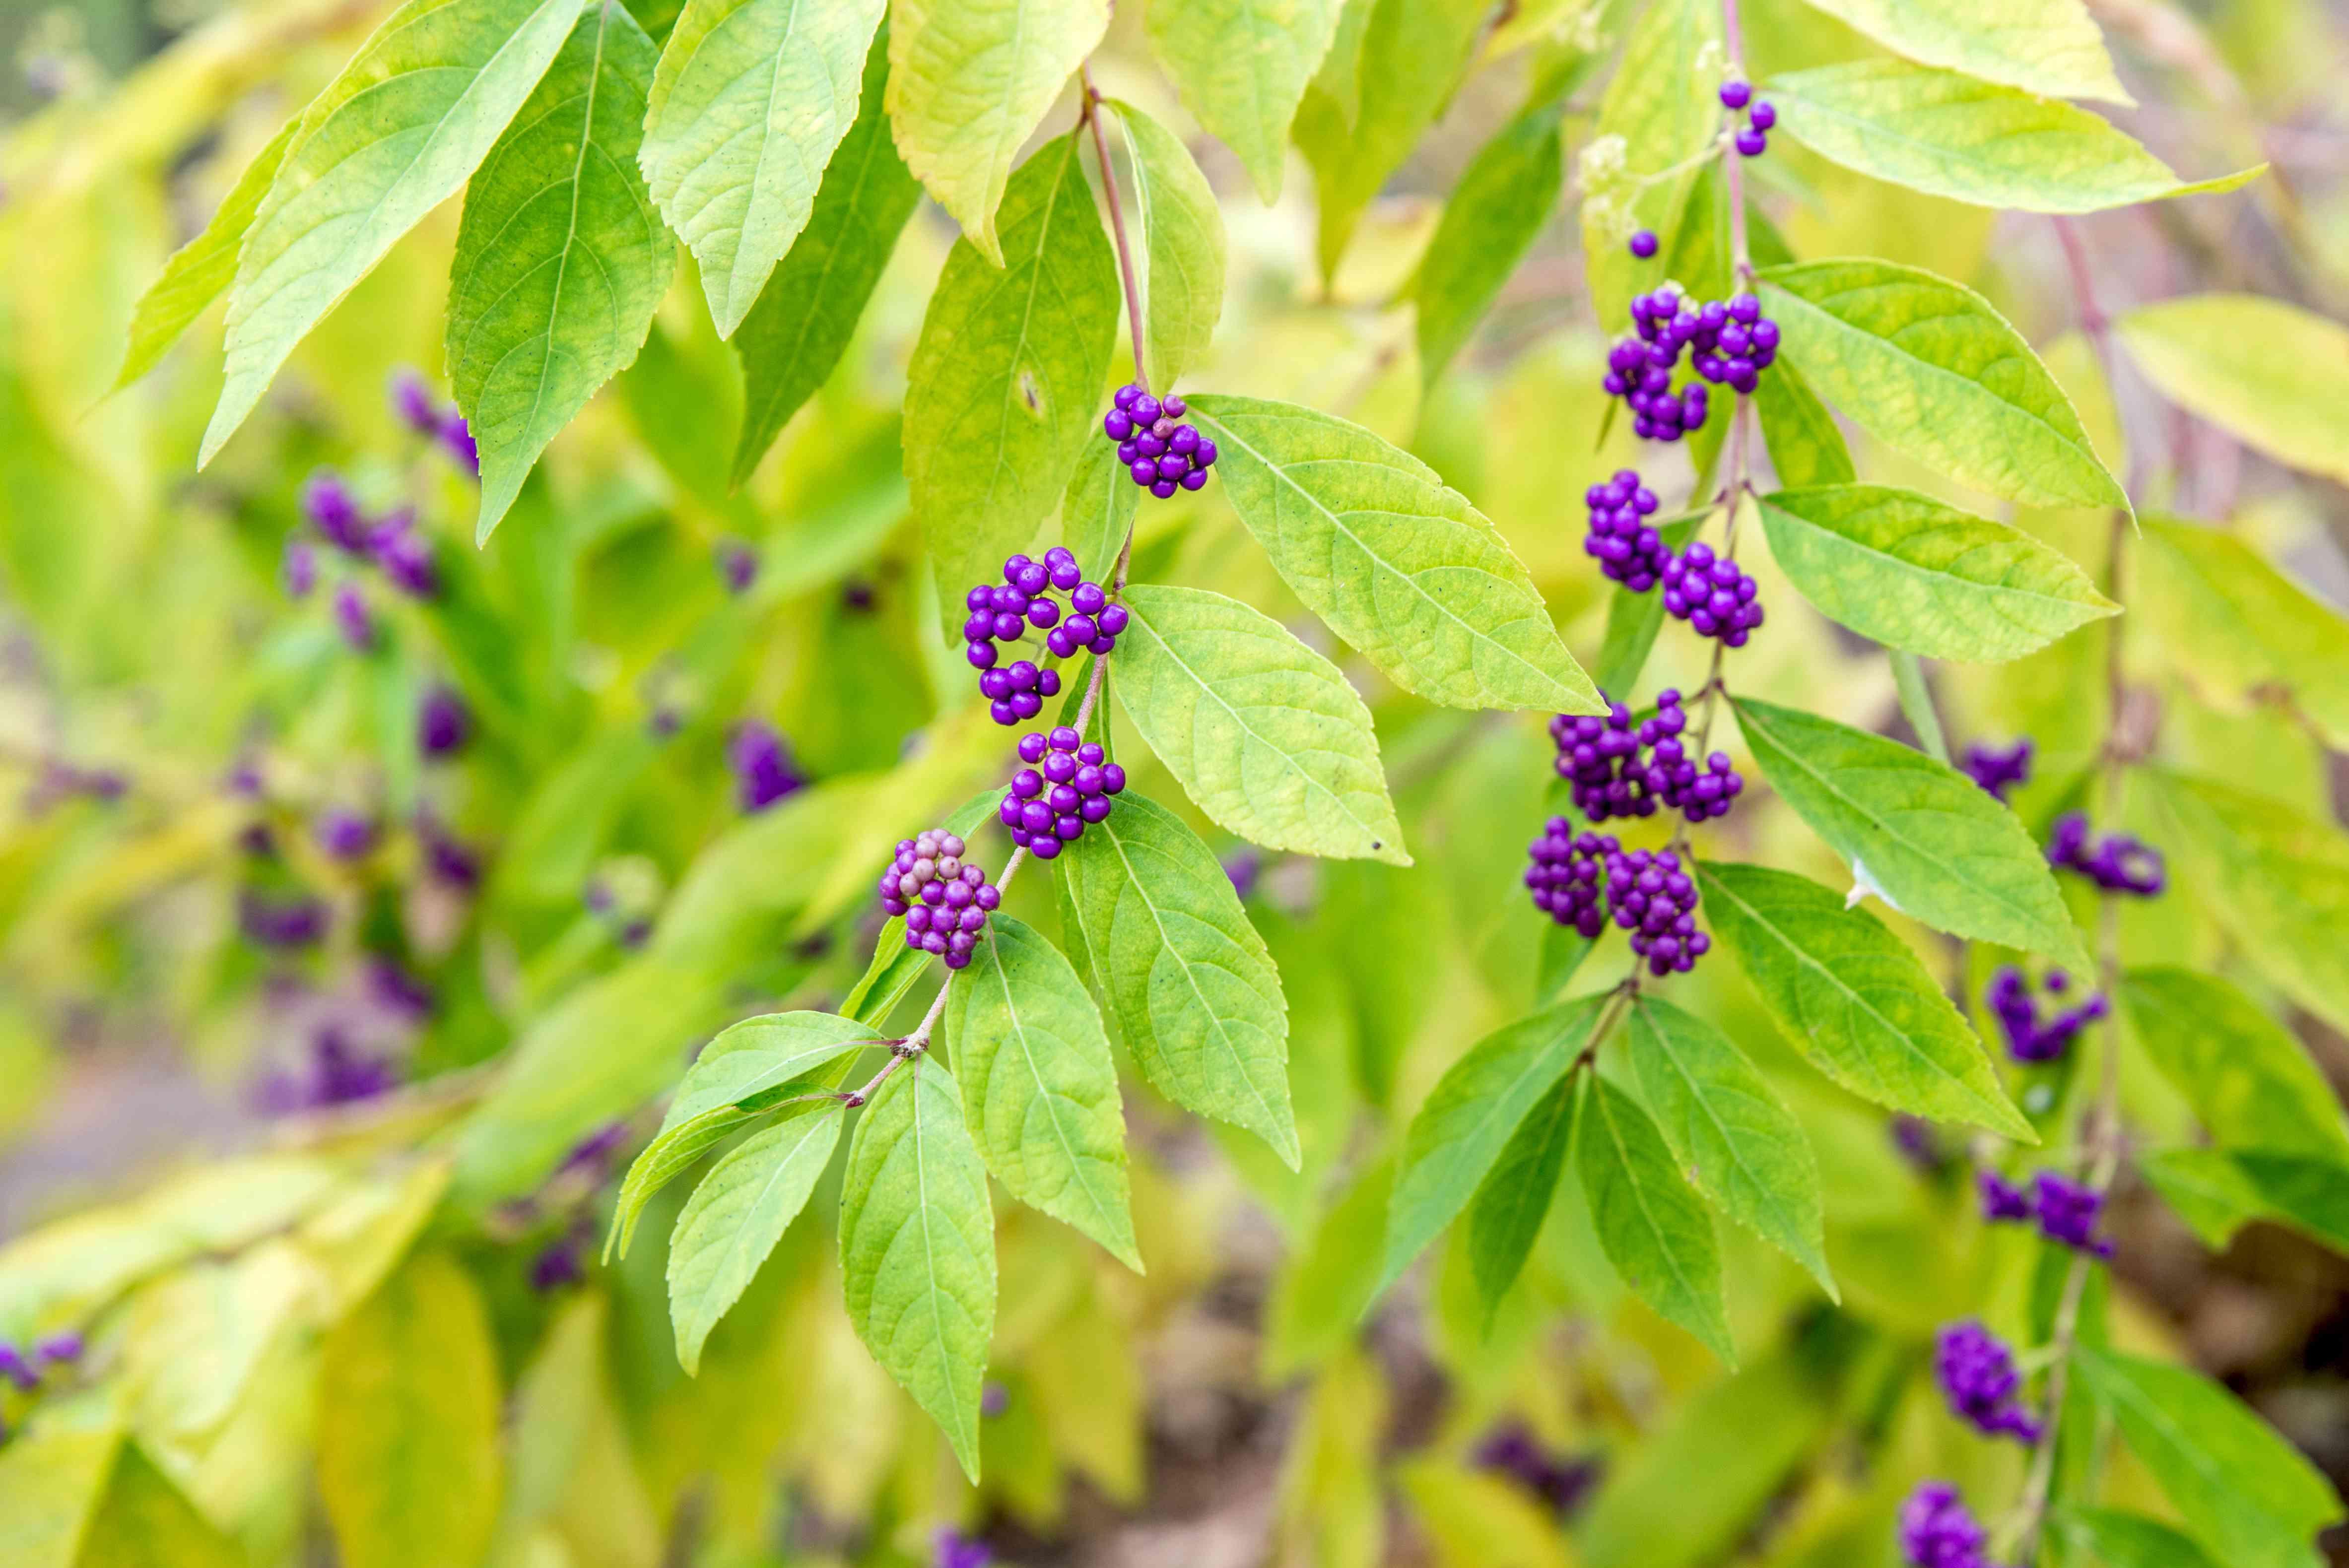 bayberry shrub